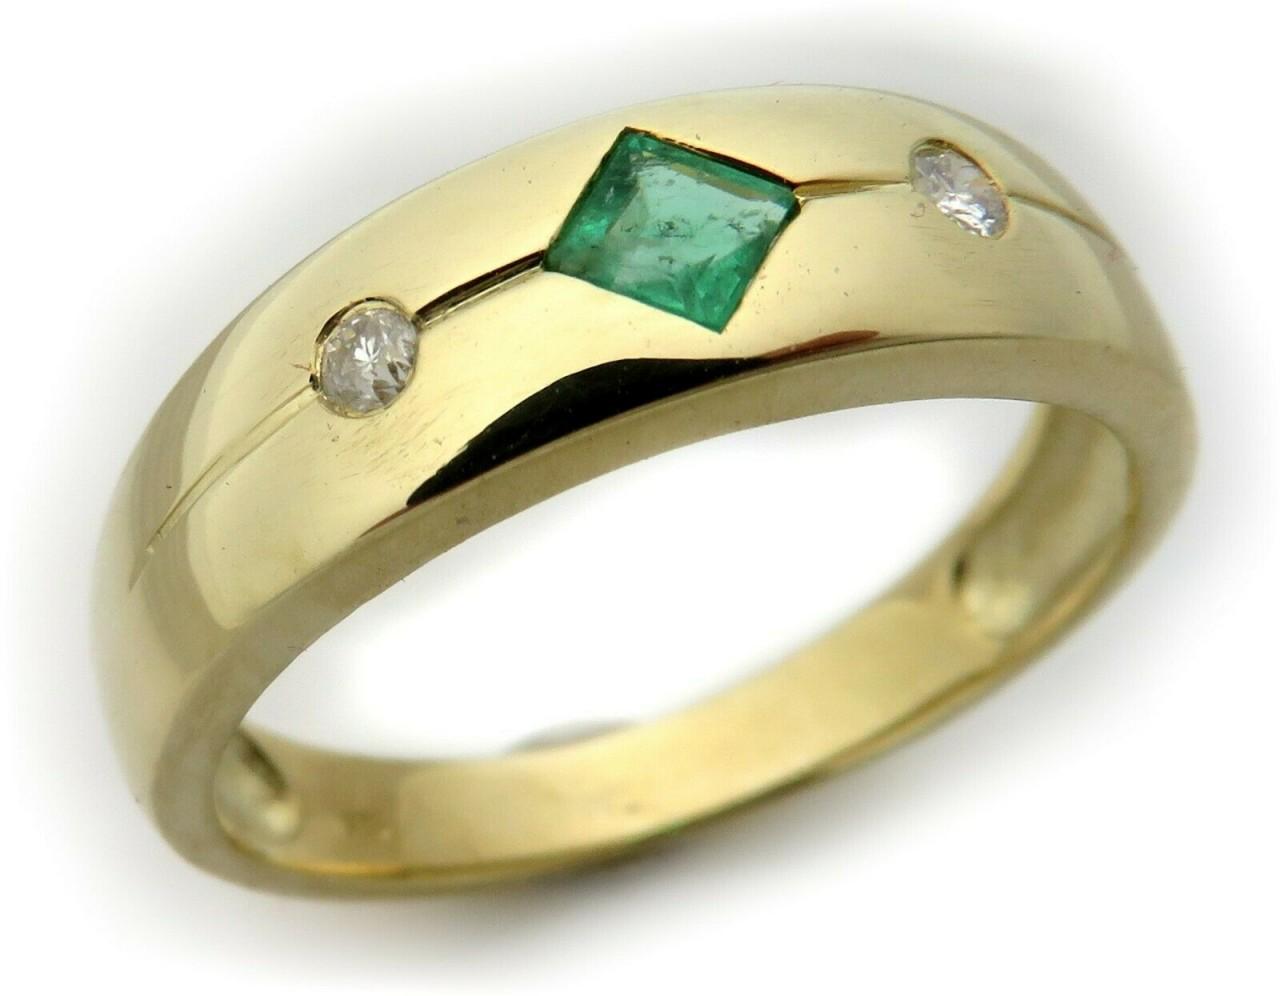 Damen Ring Smaragd m Diamant 0,04ct echt Gold 750 18 karat Gelbgold Brillant Neu